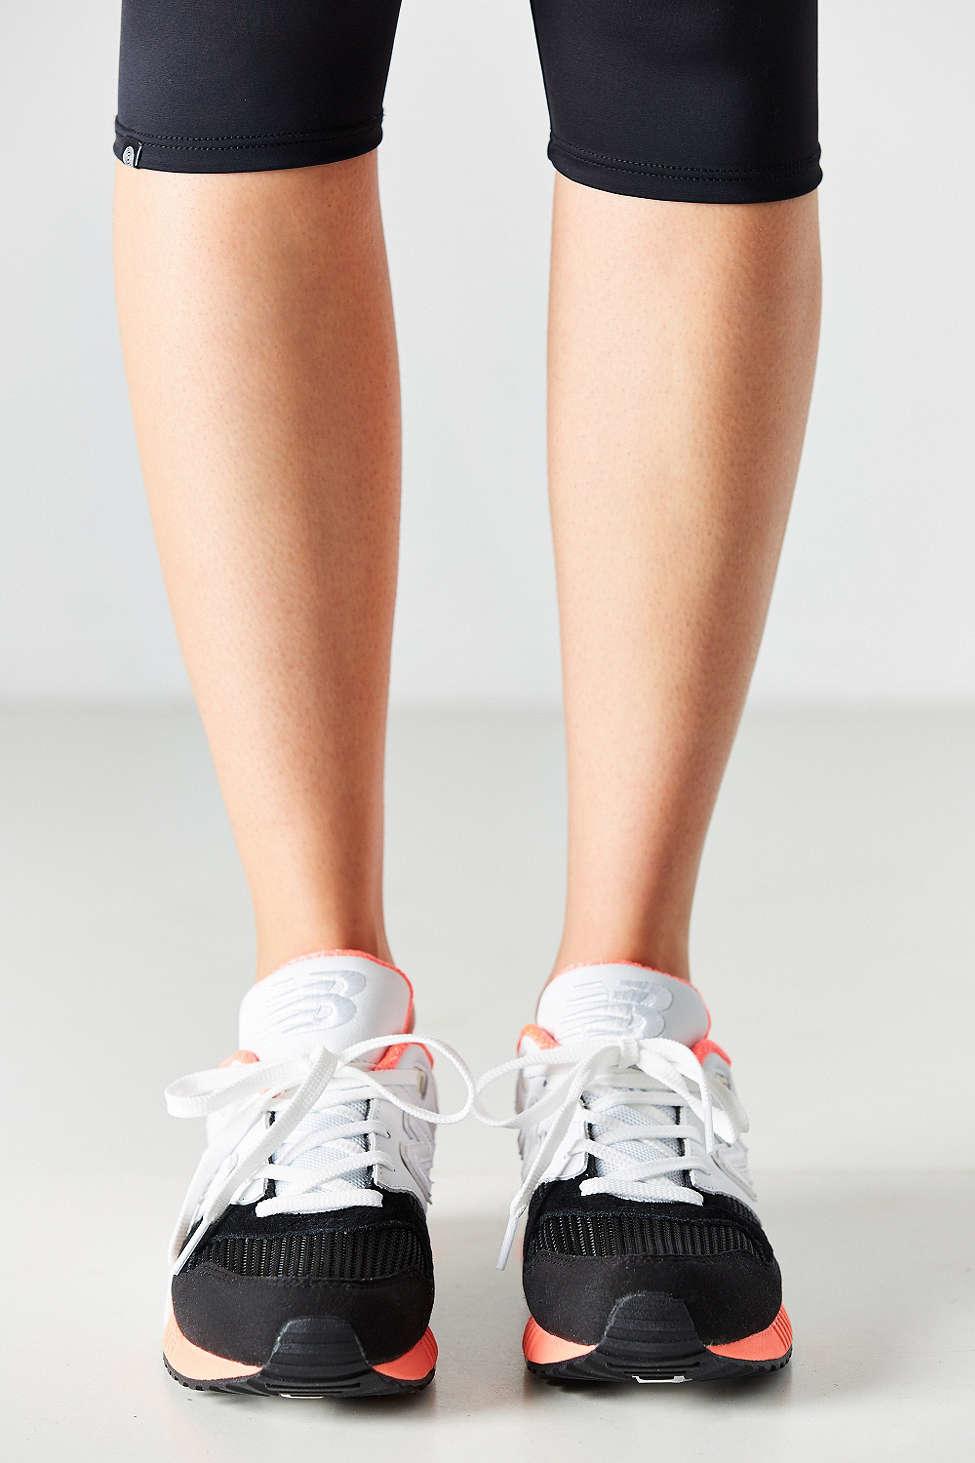 la meilleure attitude 65c8d 92276 New Balance Black 530 Bionic Boom Running Sneaker